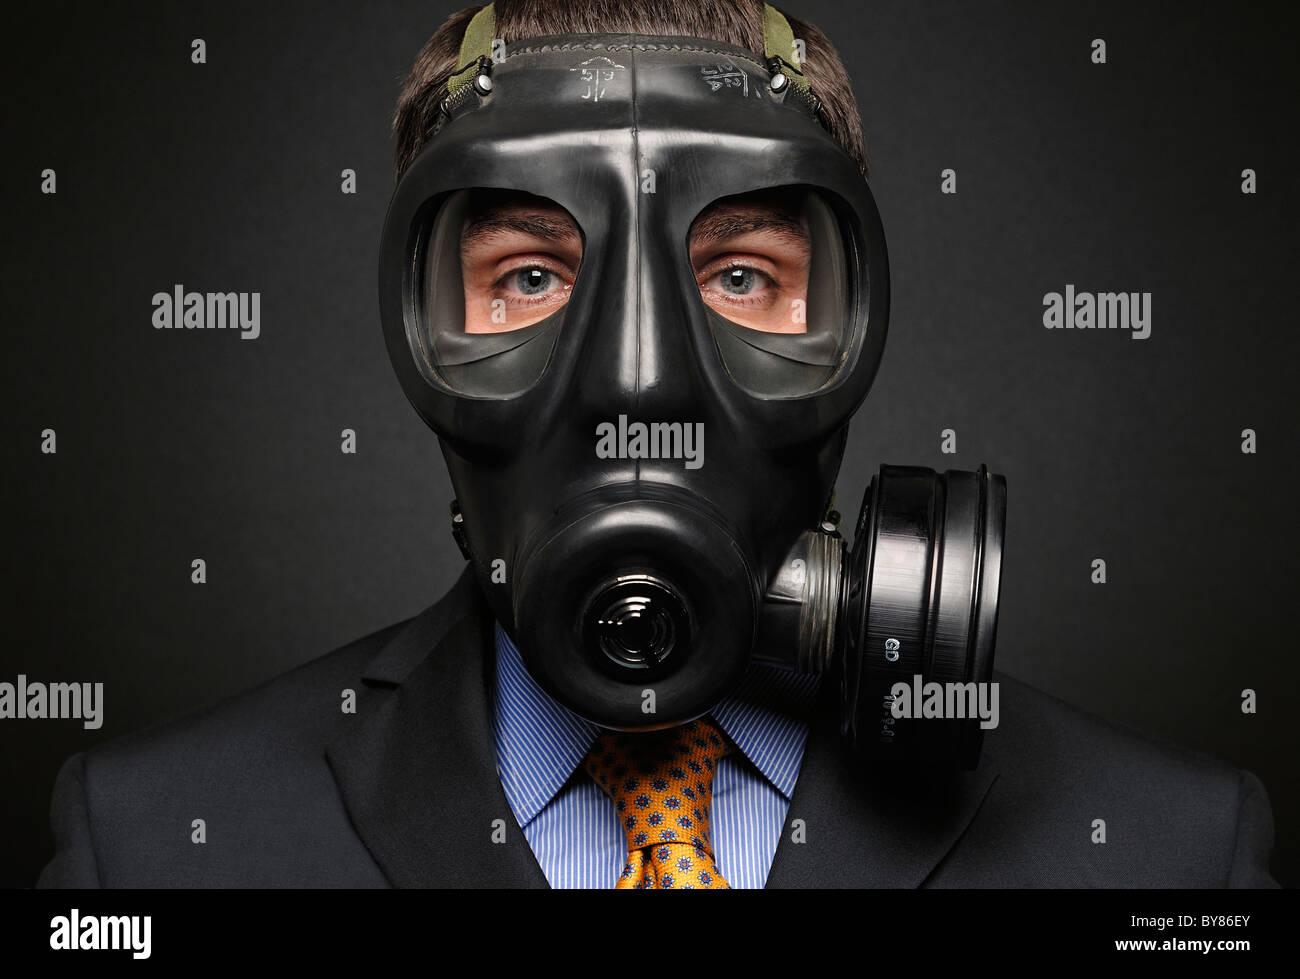 Imprenditore indossando maschera a gas Immagini Stock